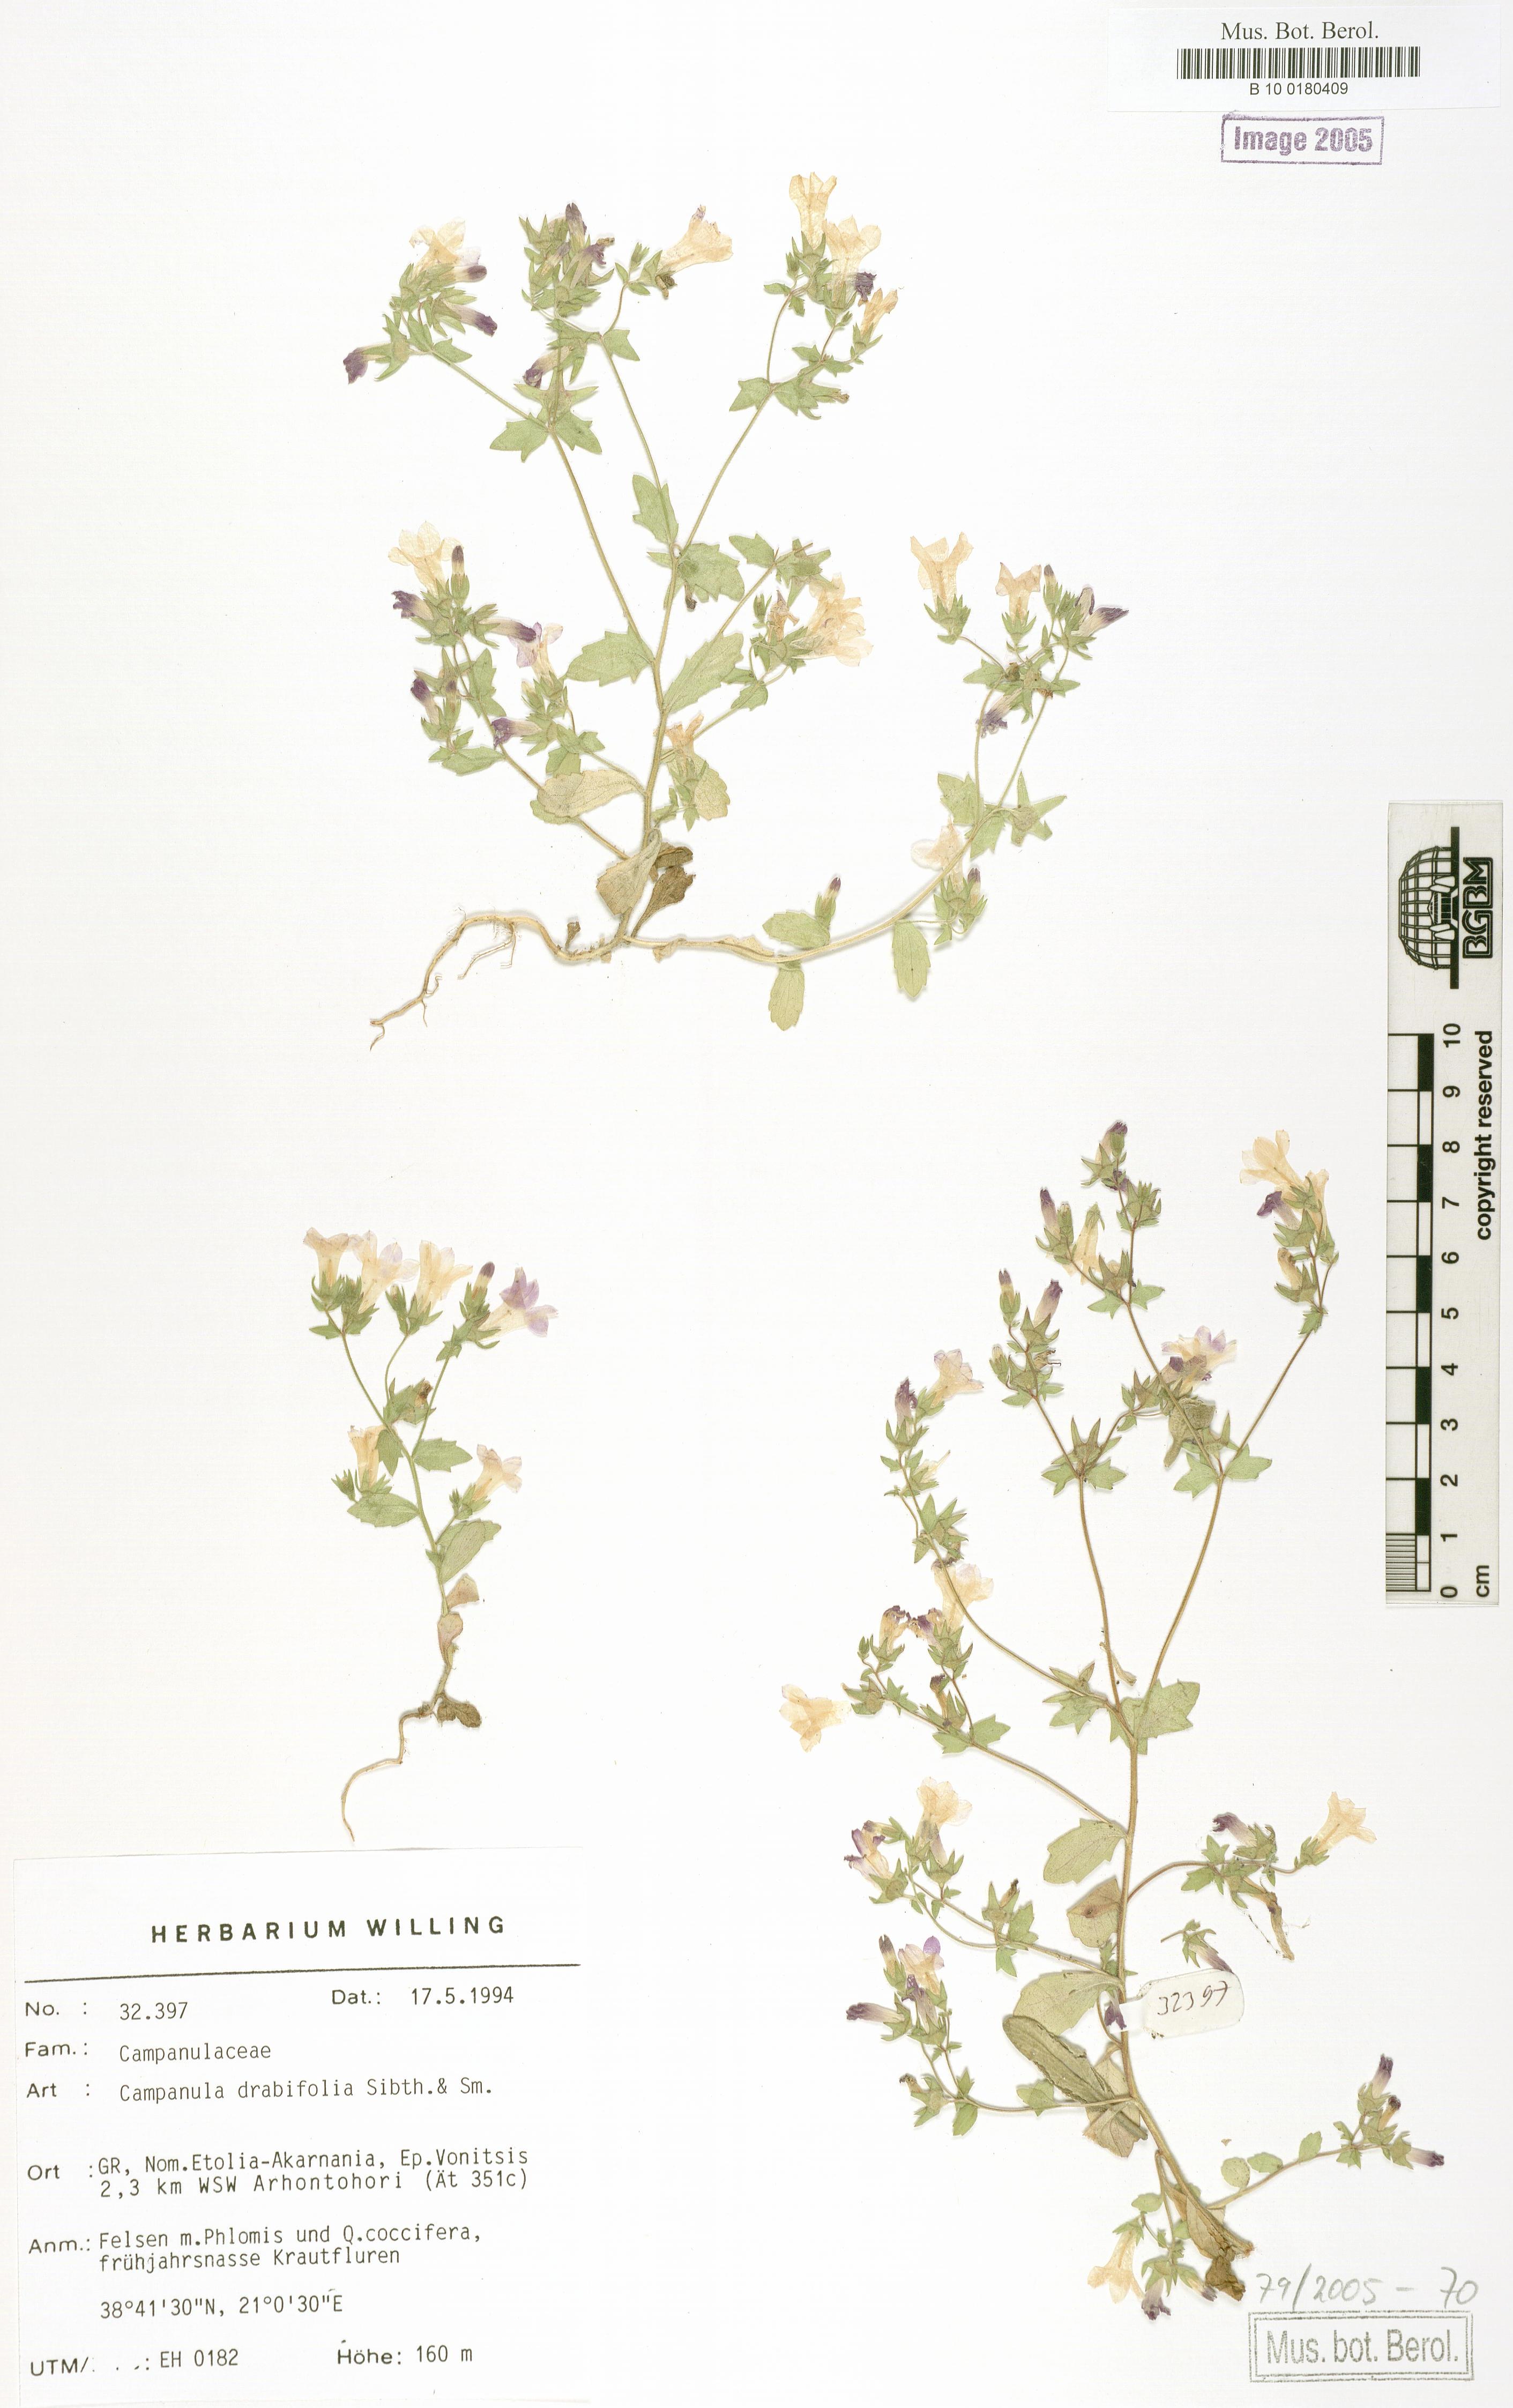 http://ww2.bgbm.org/herbarium/images/B/10/01/80/40/B_10_0180409.jpg